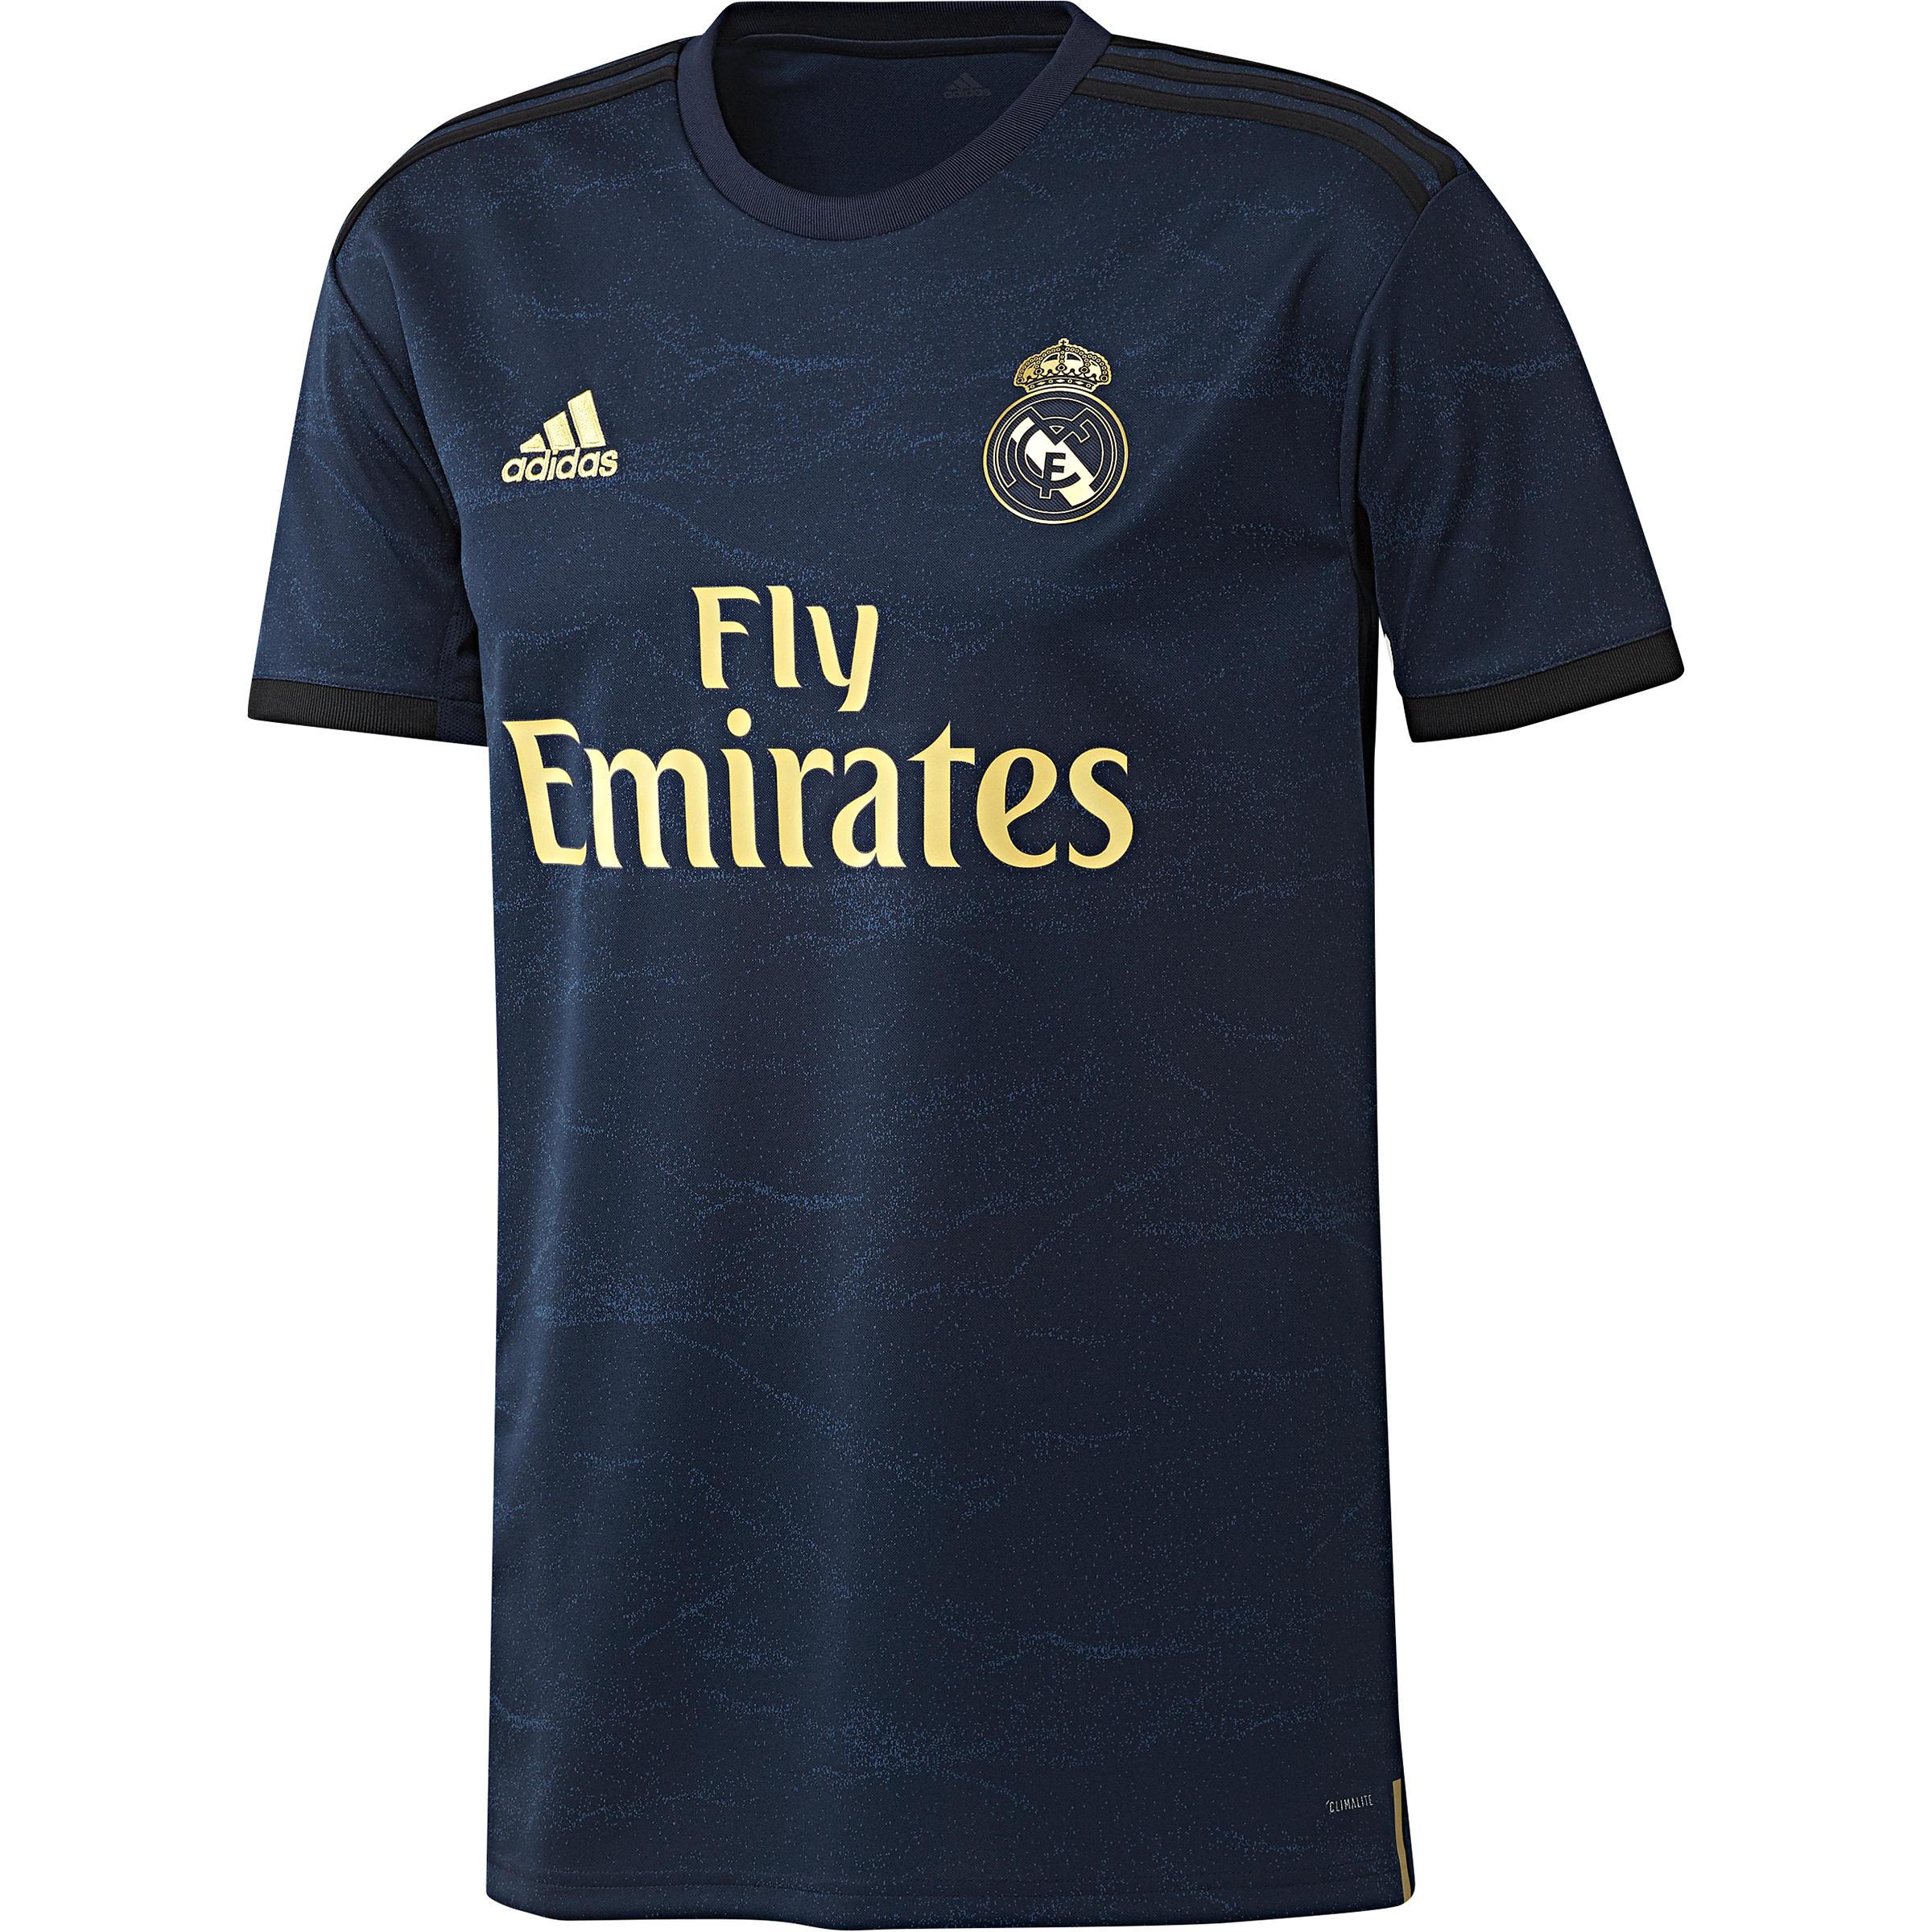 Fußballtrikot Real Madrid Auswärts Erwachsene | Sportbekleidung > Trikots > Fußballtrikots | Adidas